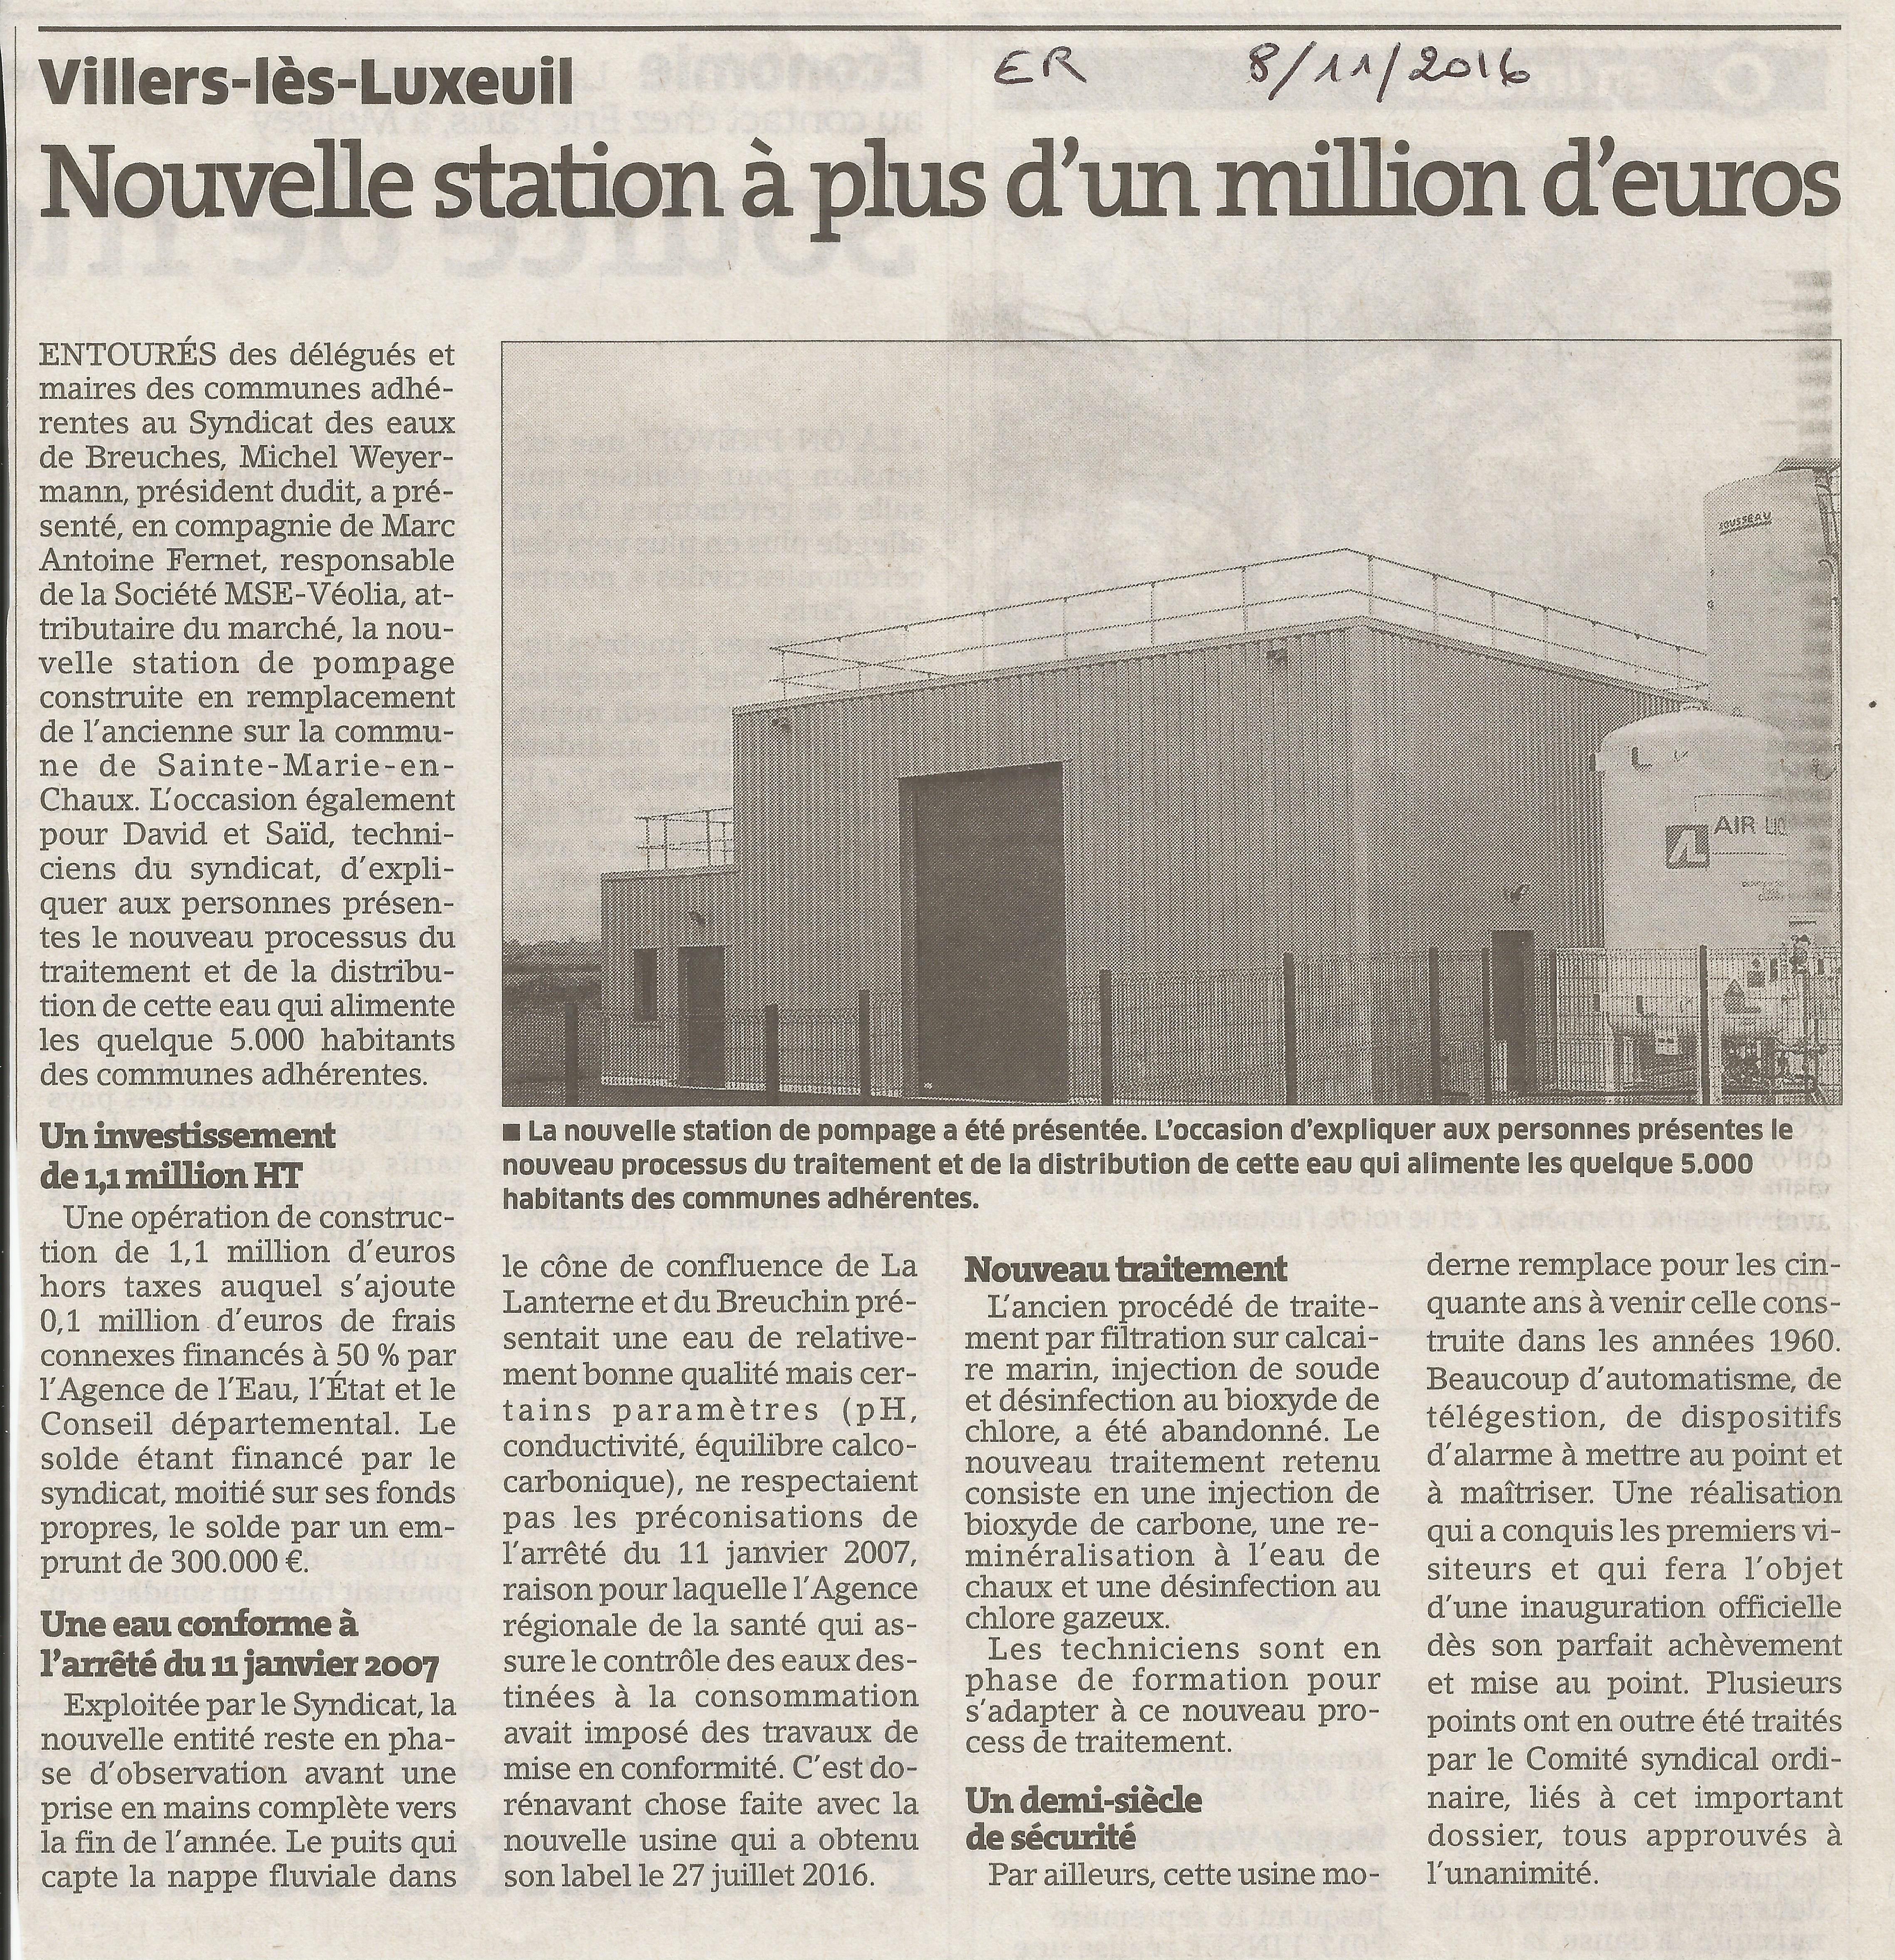 https://www.villers-les-luxeuil.com/projets/villers/files/images/2016_Mairie/Presse/2016_11_08.jpg